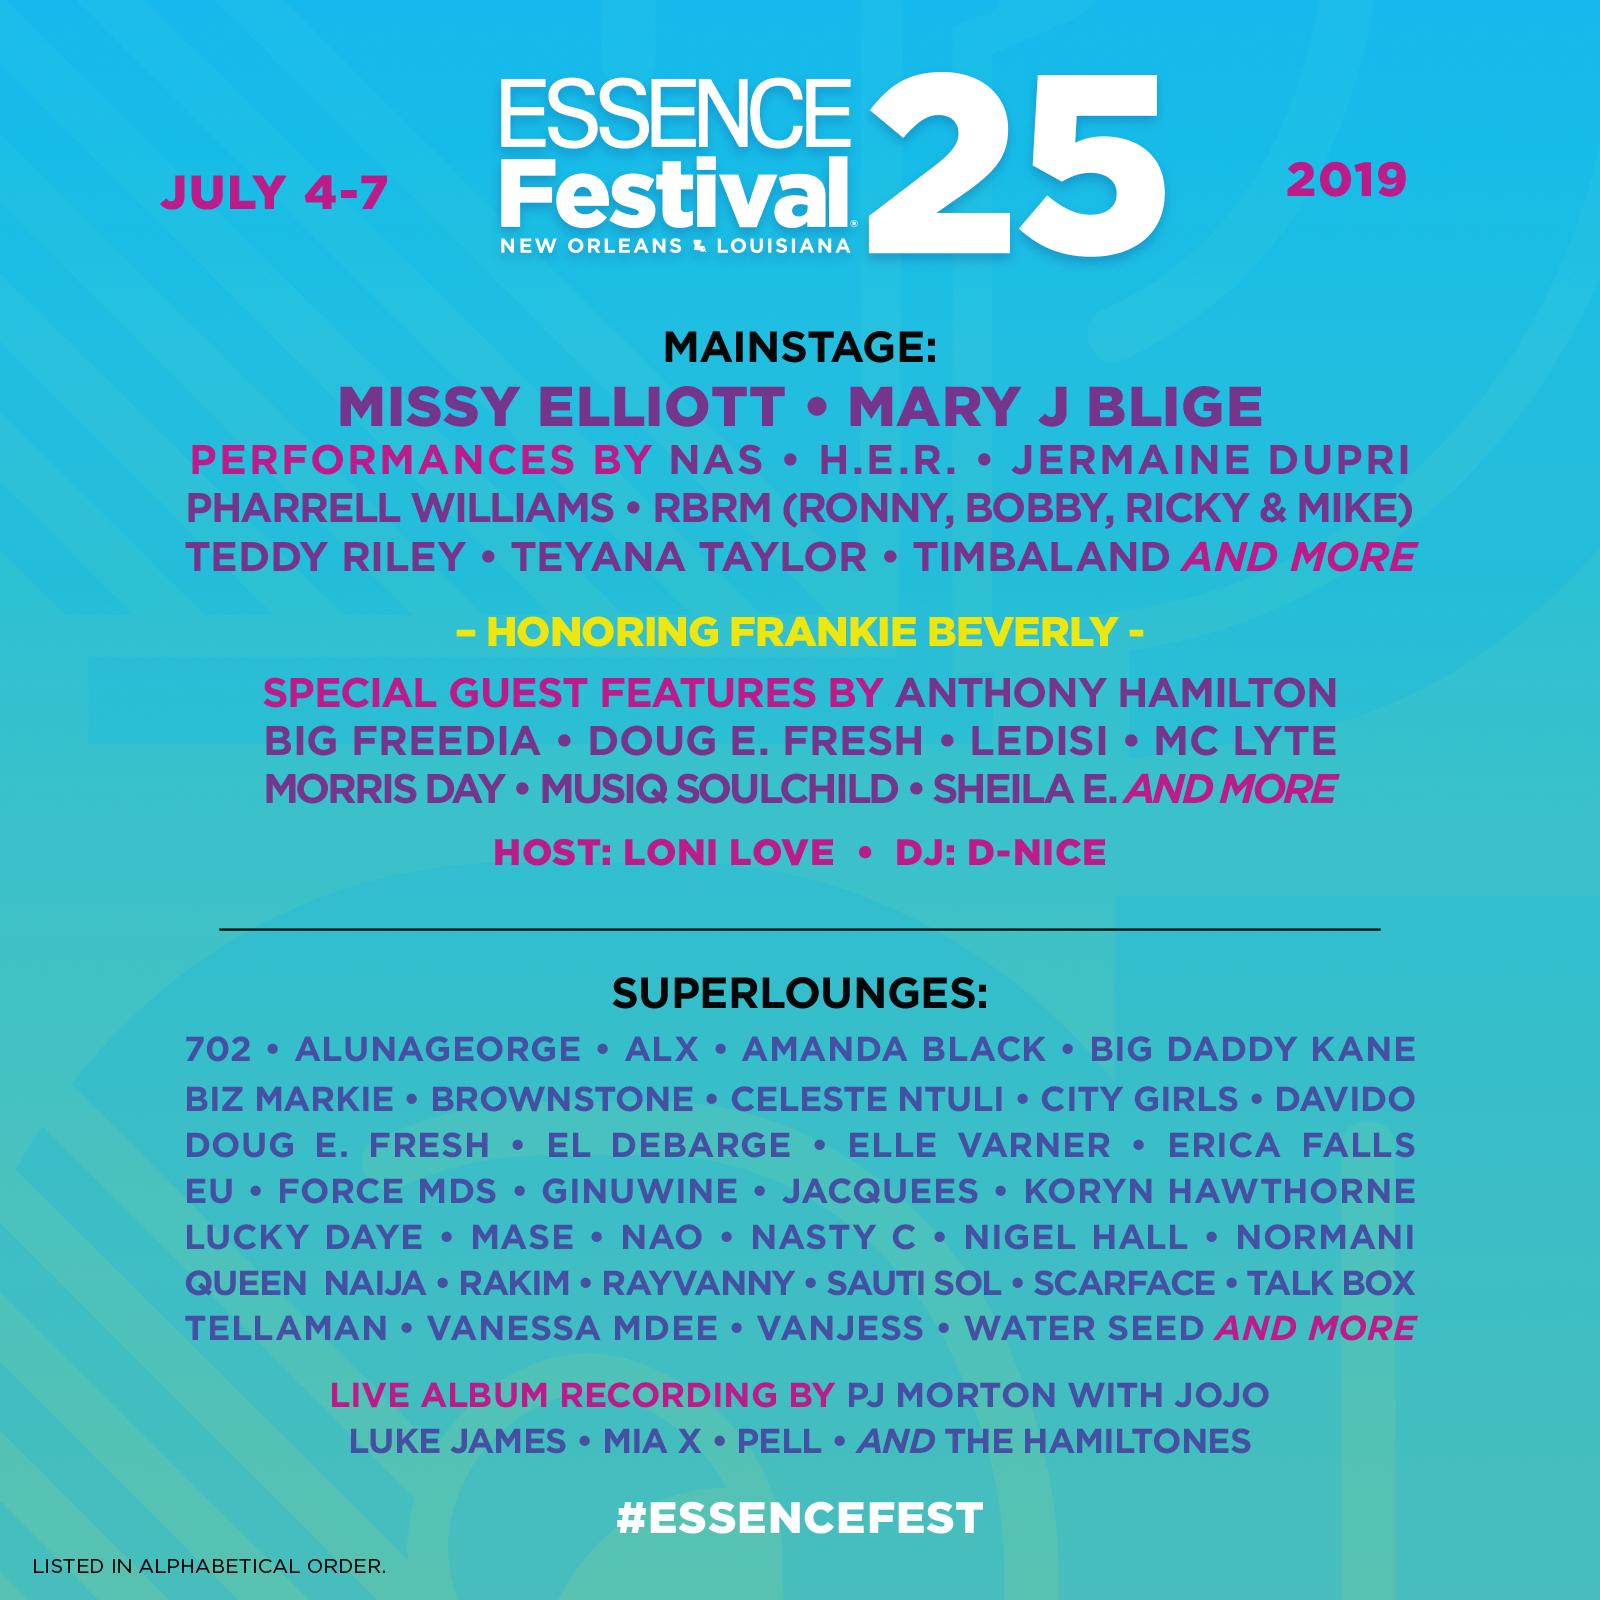 2019 Essence Festival